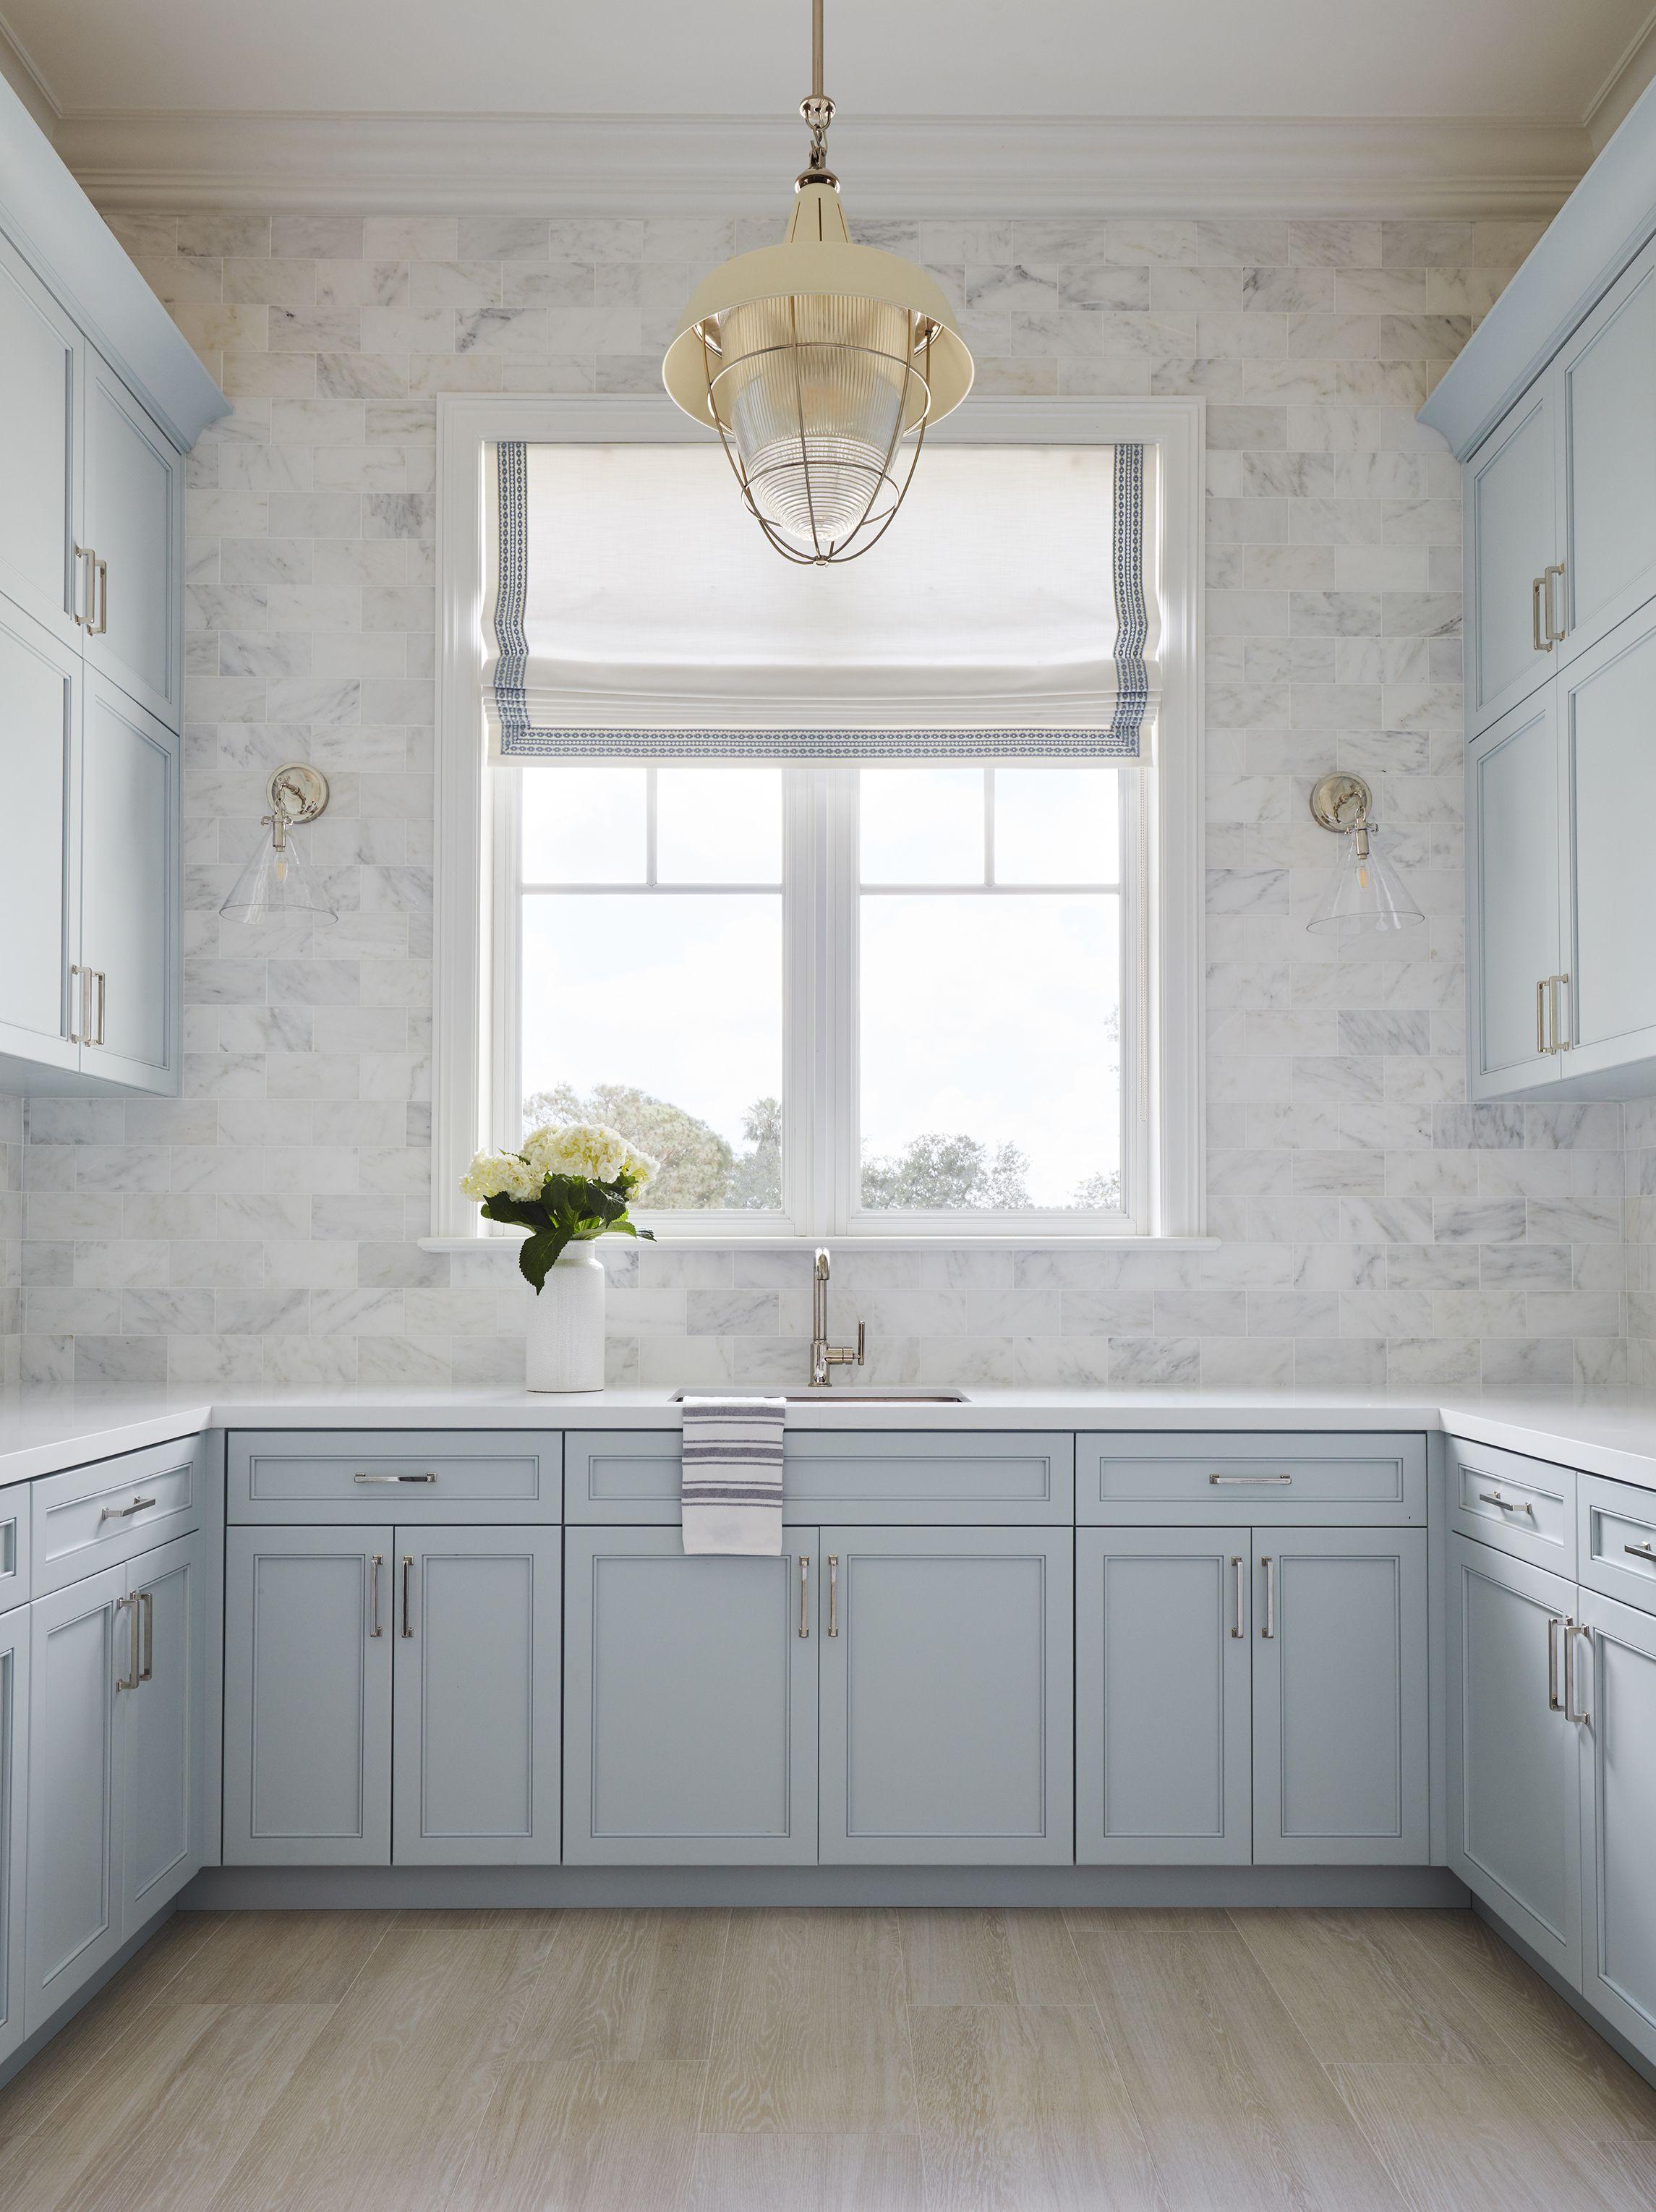 Laundry Resized 20mb Jpg Light Blue Kitchens Home Kitchen Marble